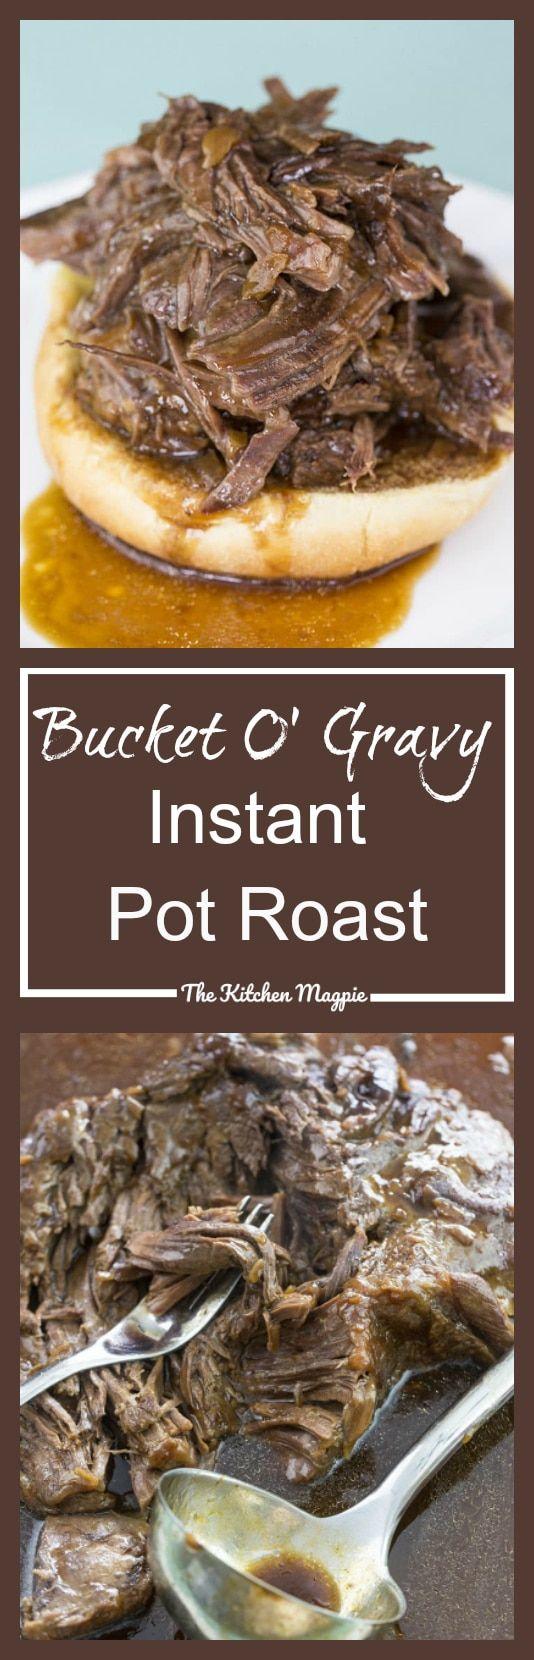 Bucket o' Gravy Instant Pot Roast - The Kitchen Magpie